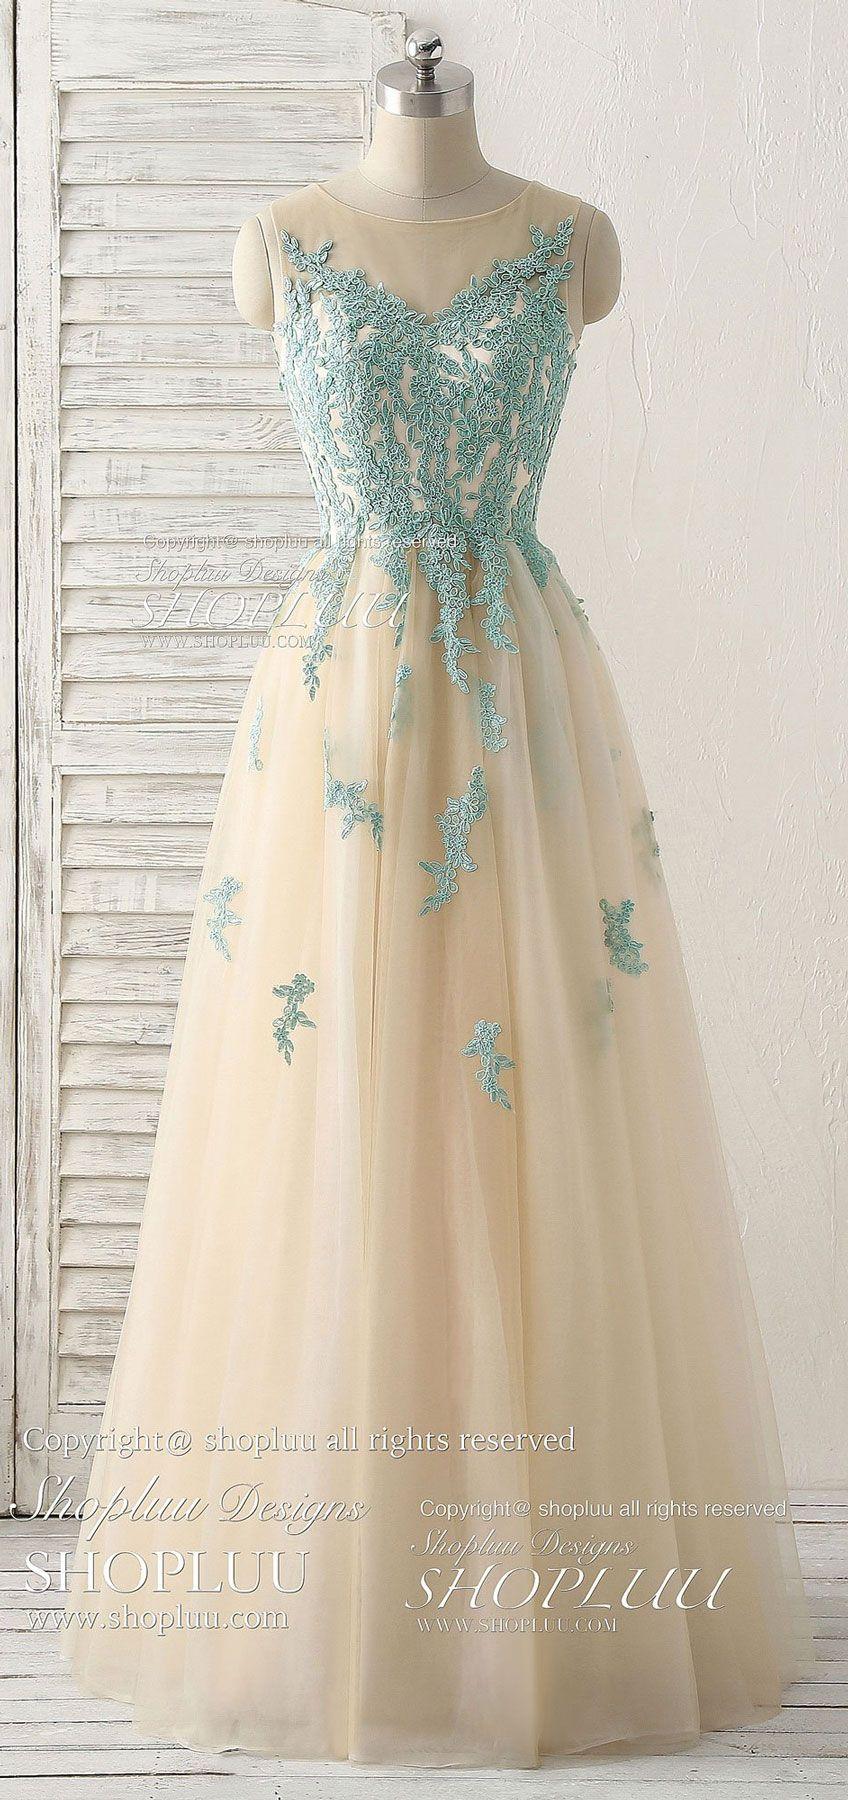 Cute green lace long prom dress tulle bridesmaid dress dresses